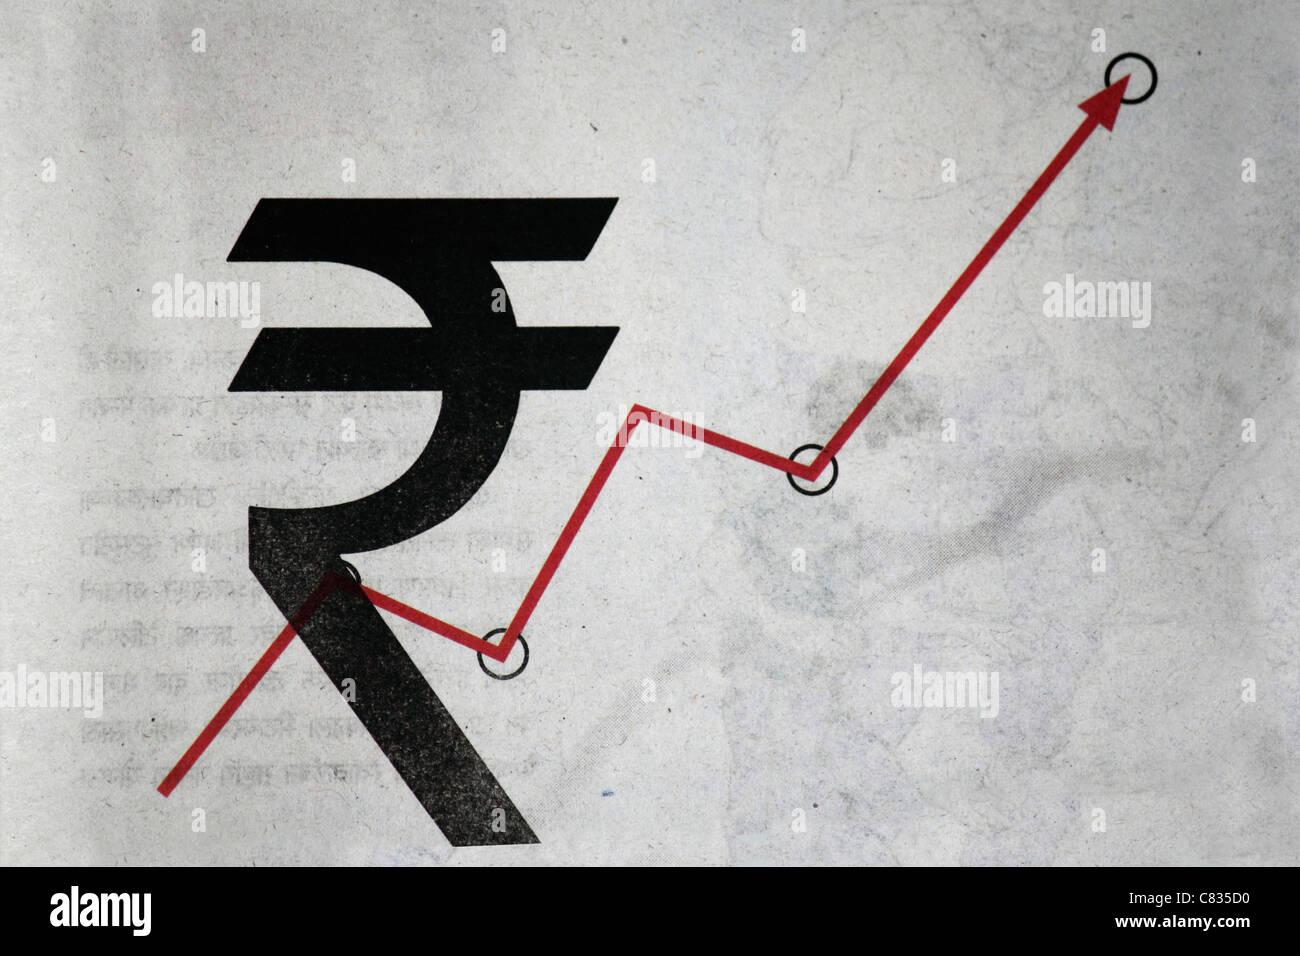 Rupee symbol stock photos rupee symbol stock images alamy rupee symbol with arrow graph stock image buycottarizona